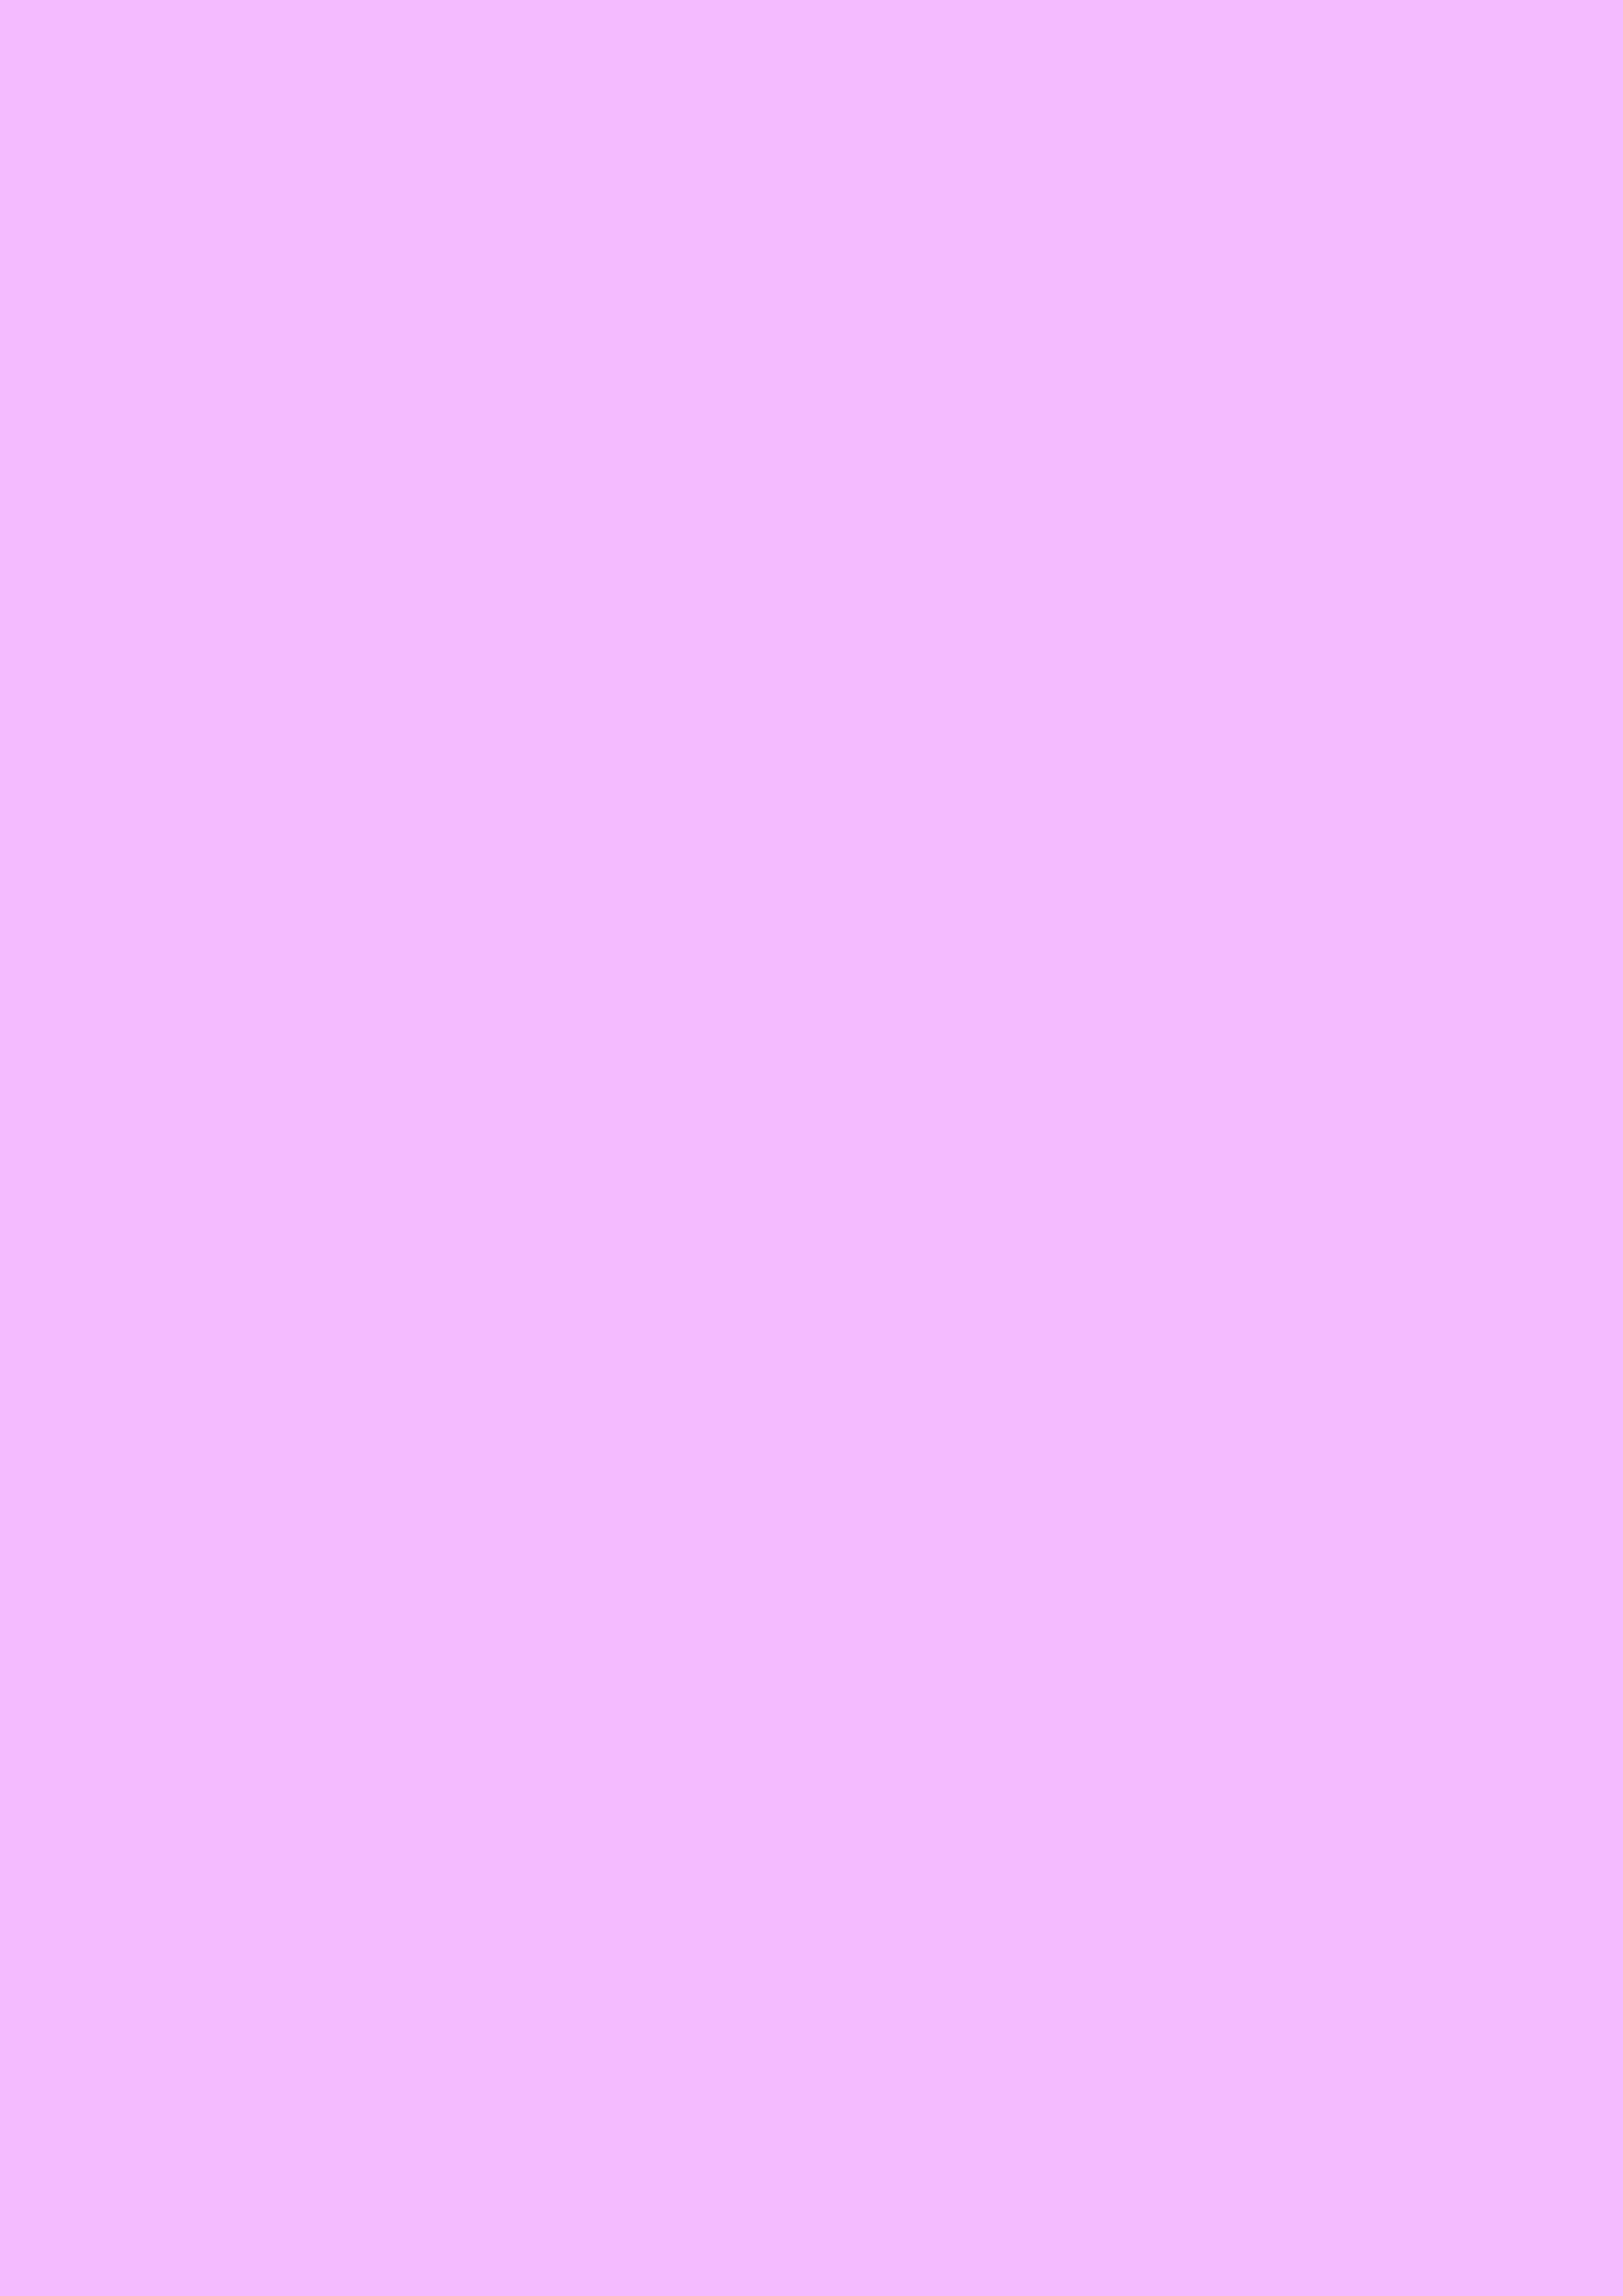 2480x3508 Brilliant Lavender Solid Color Background